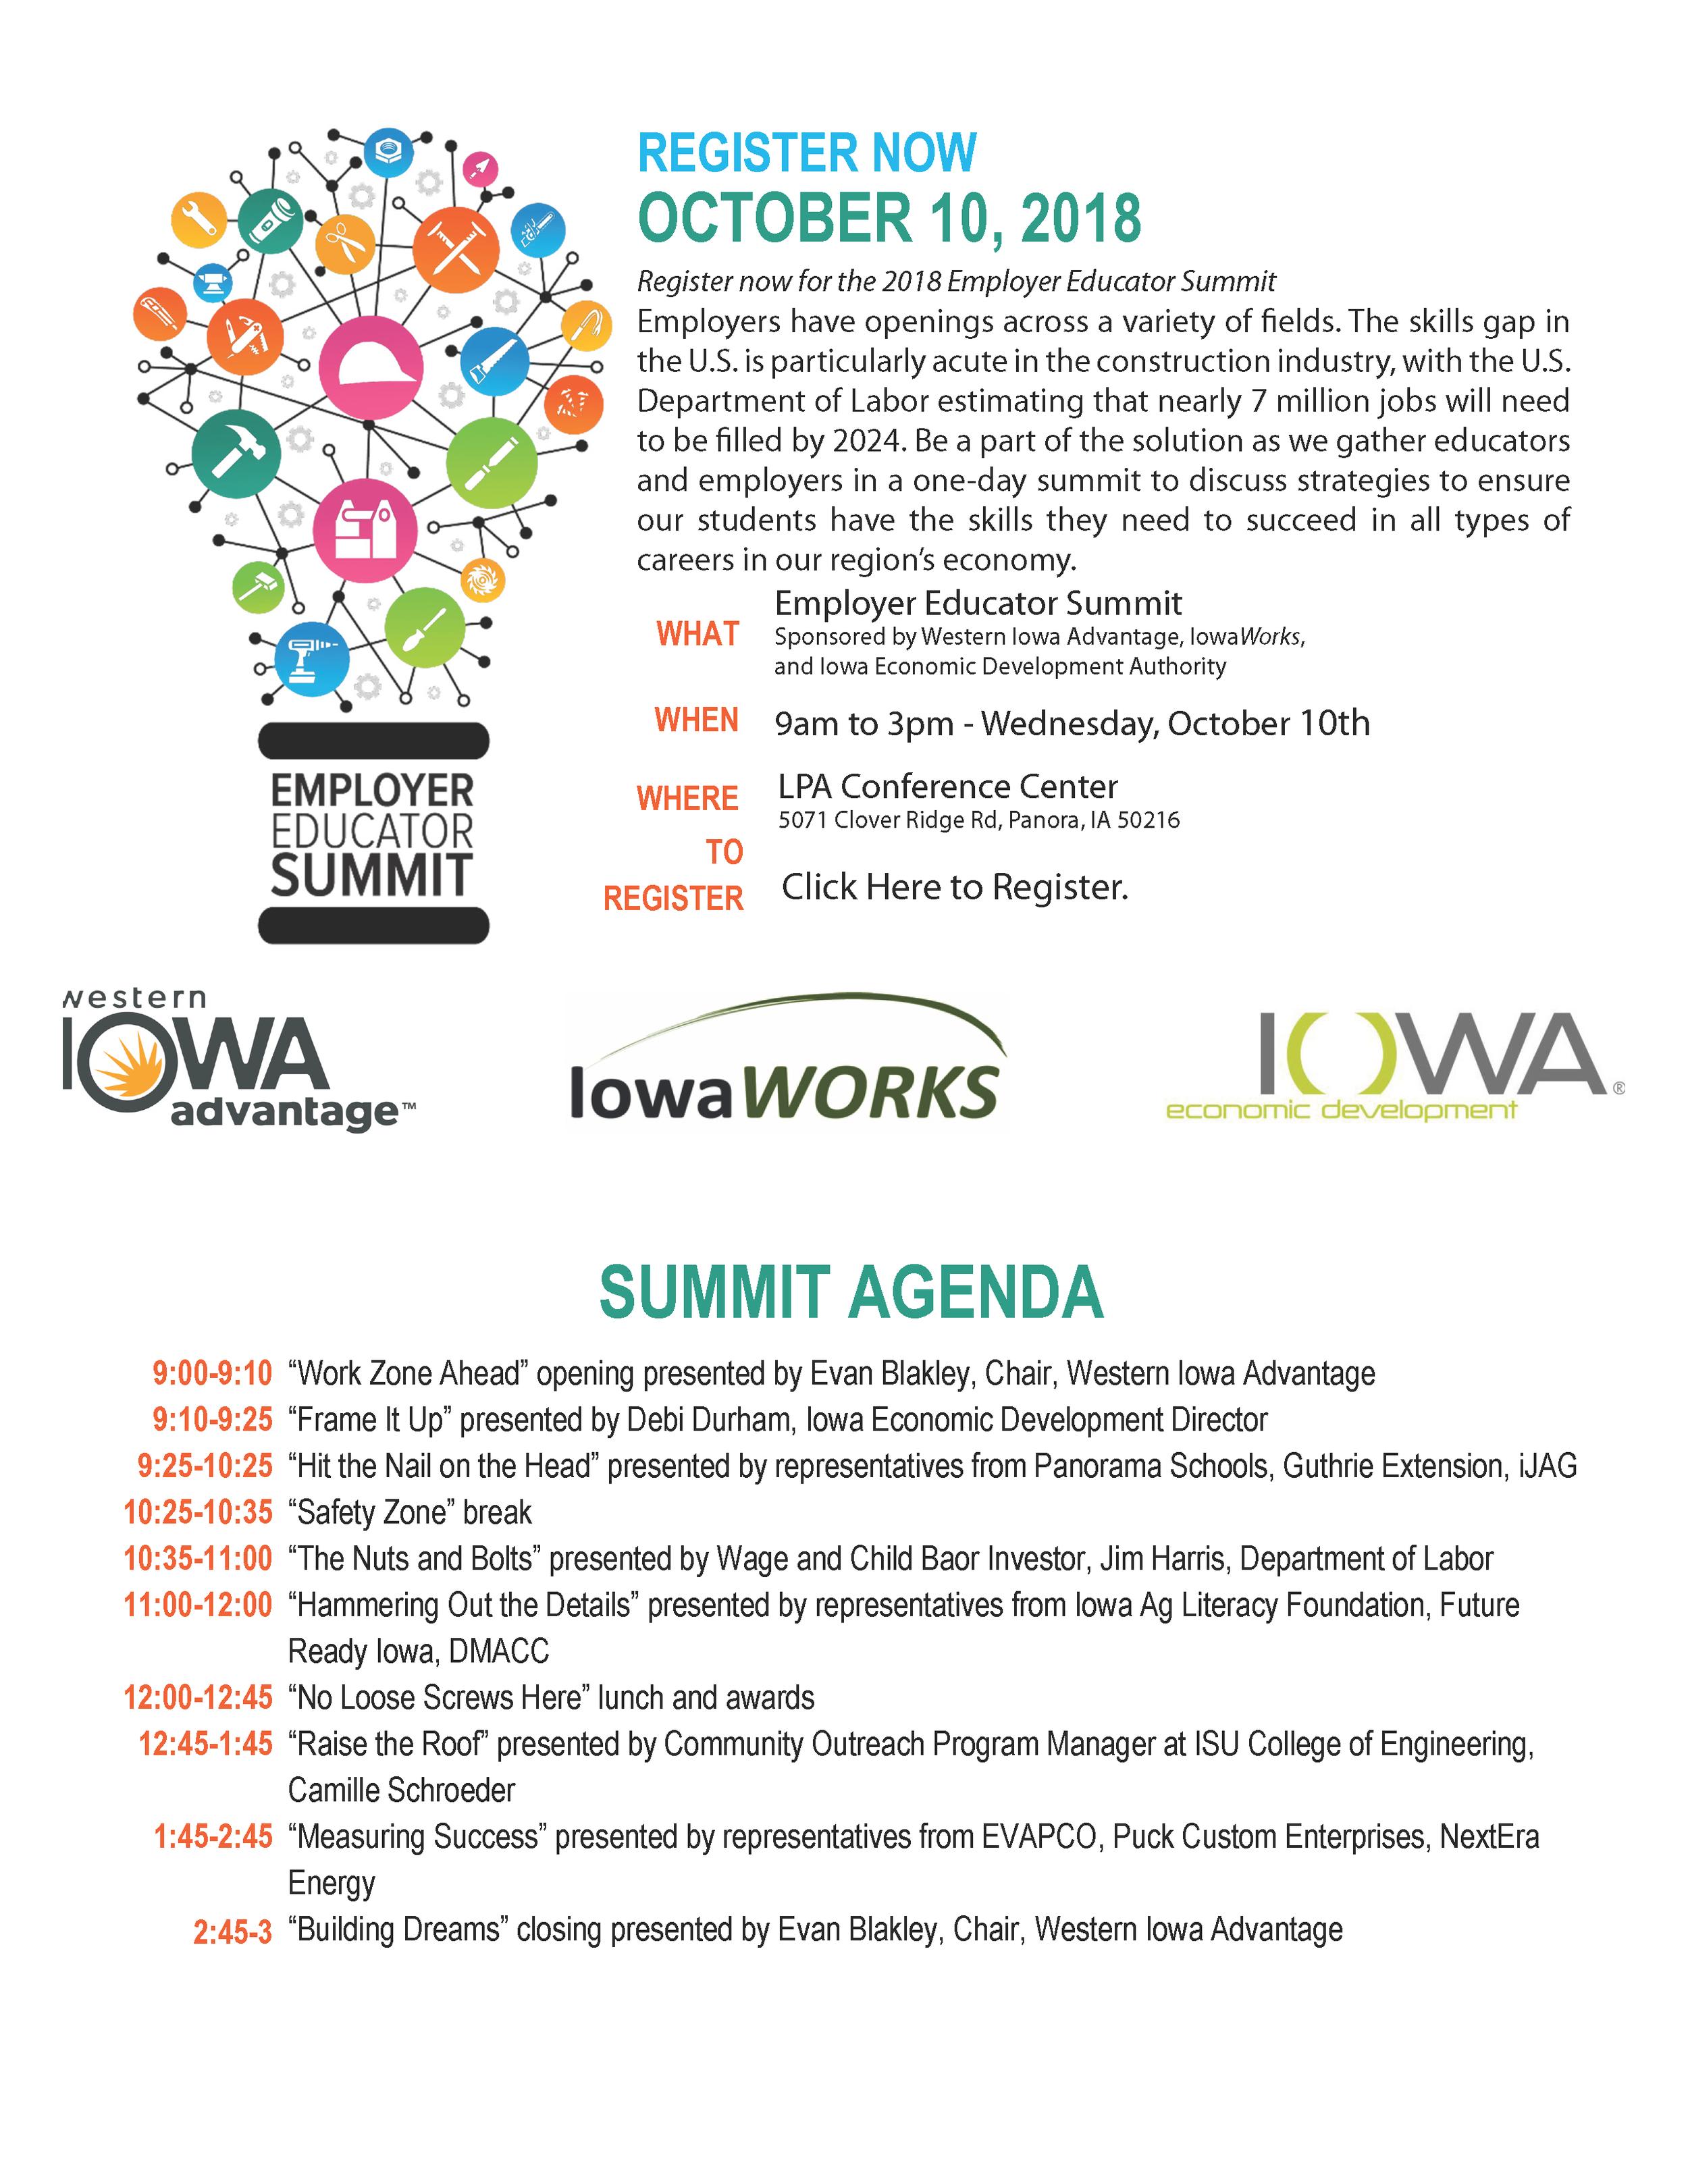 EE Summit Agenda-Register Now.png